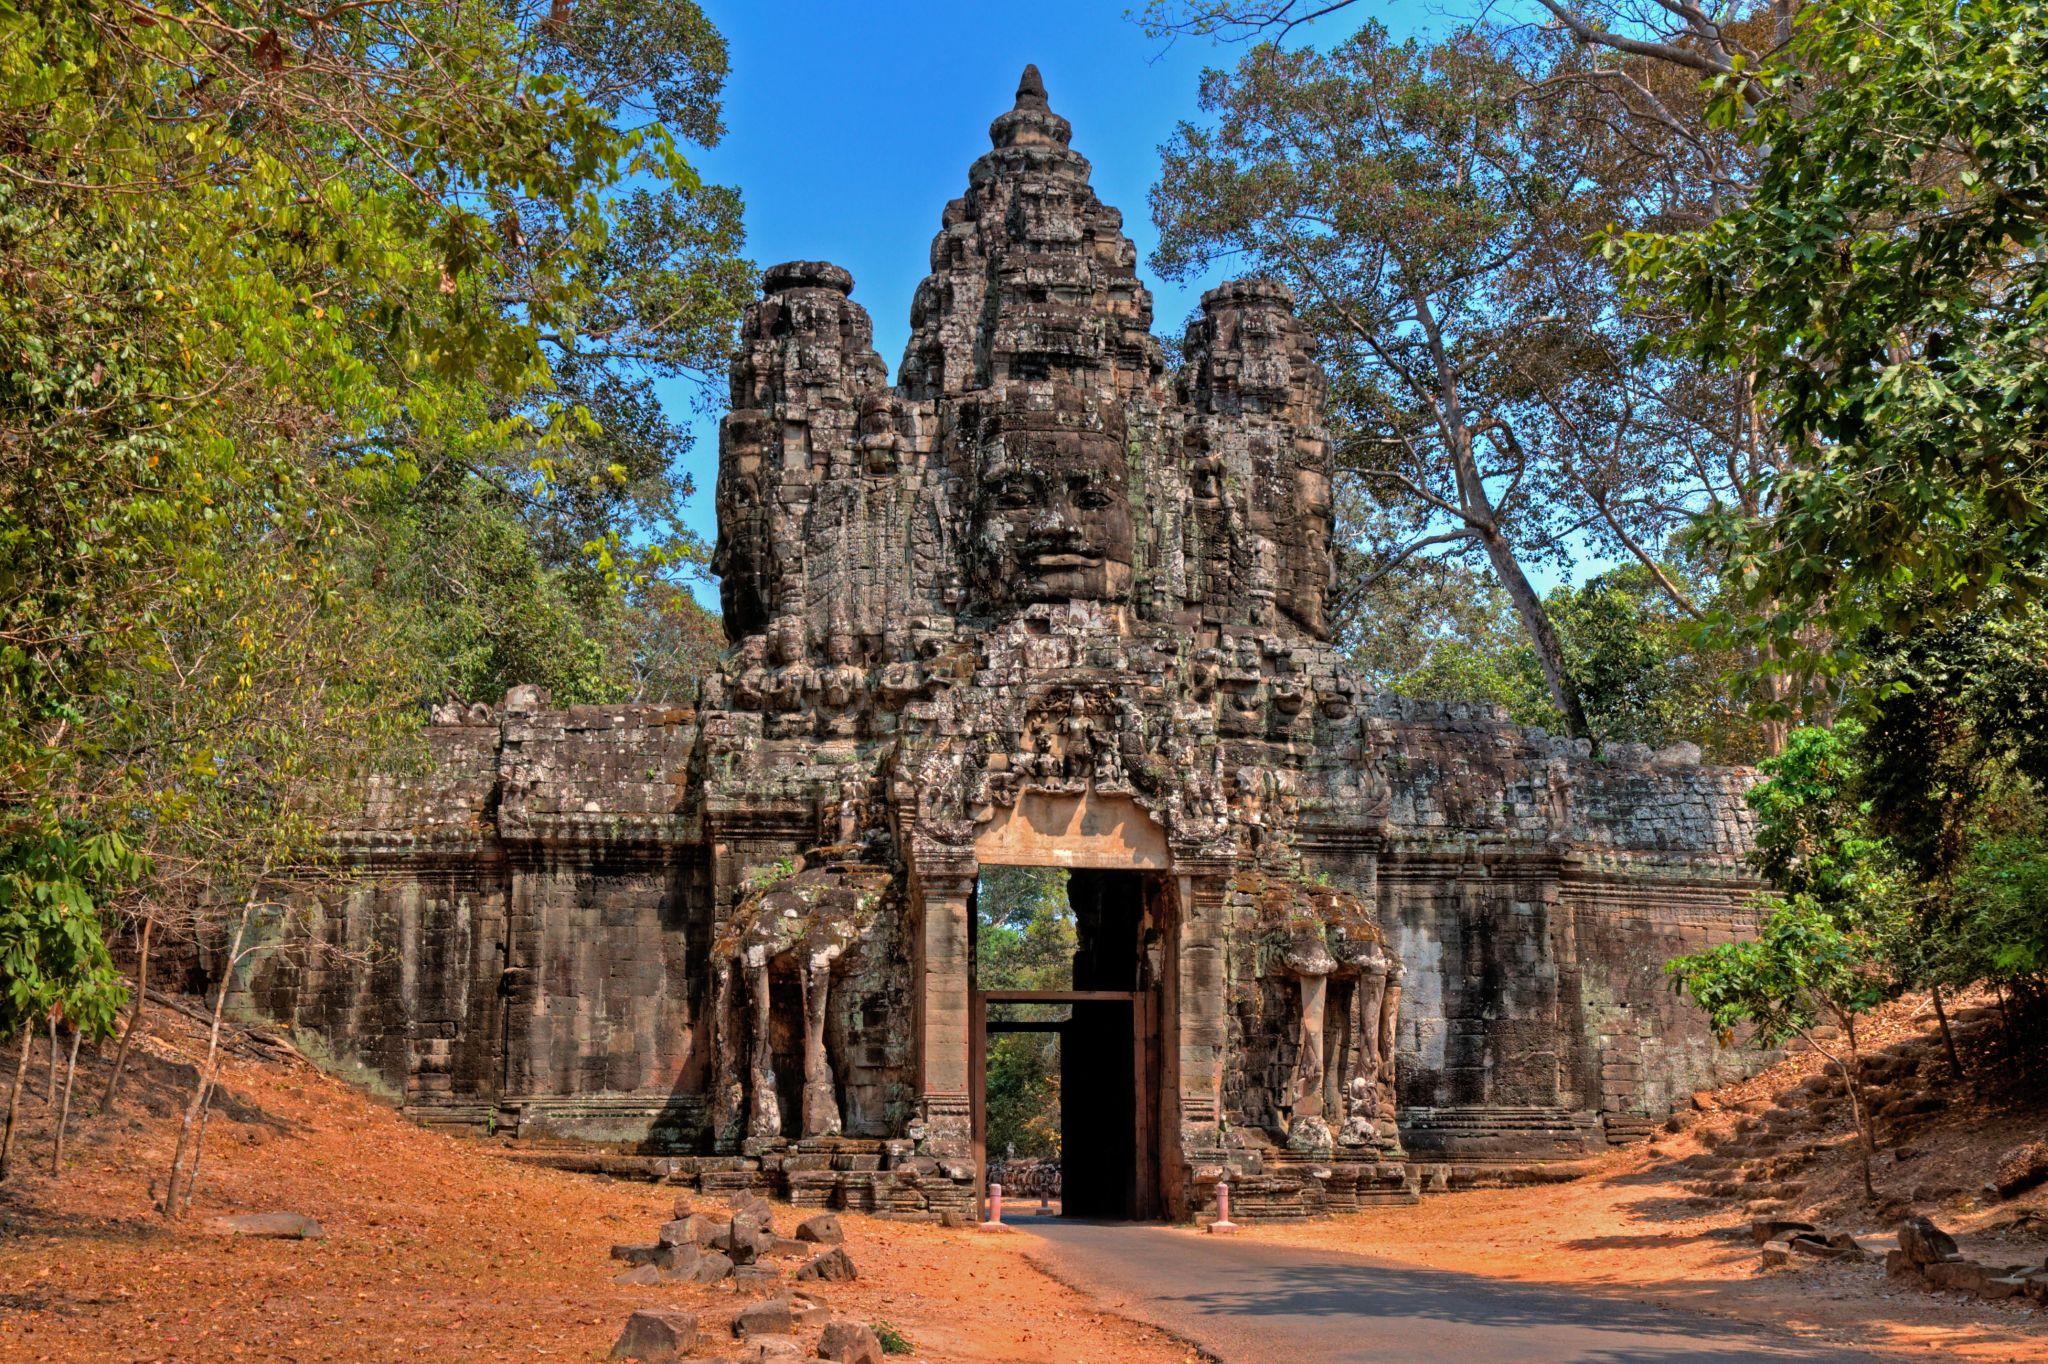 Angkor Thom Victory Gate, Cambodia